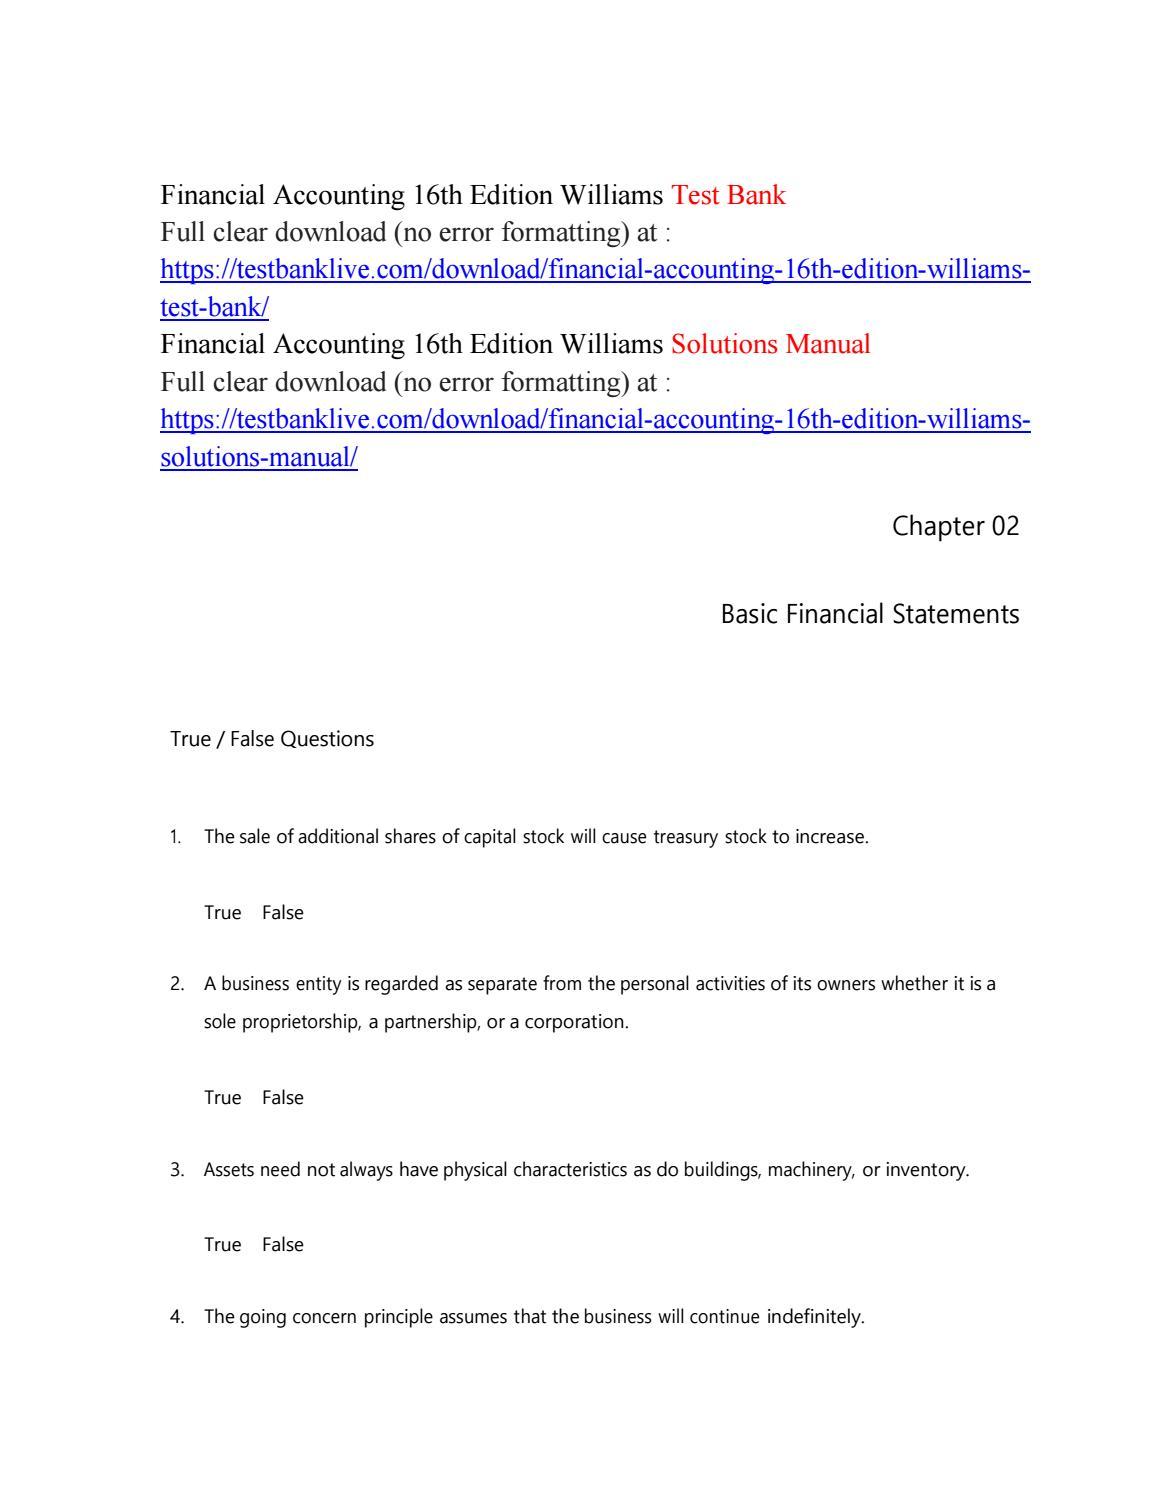 Financial accounting 16th edition williams test bank by kingdom488 - issuu